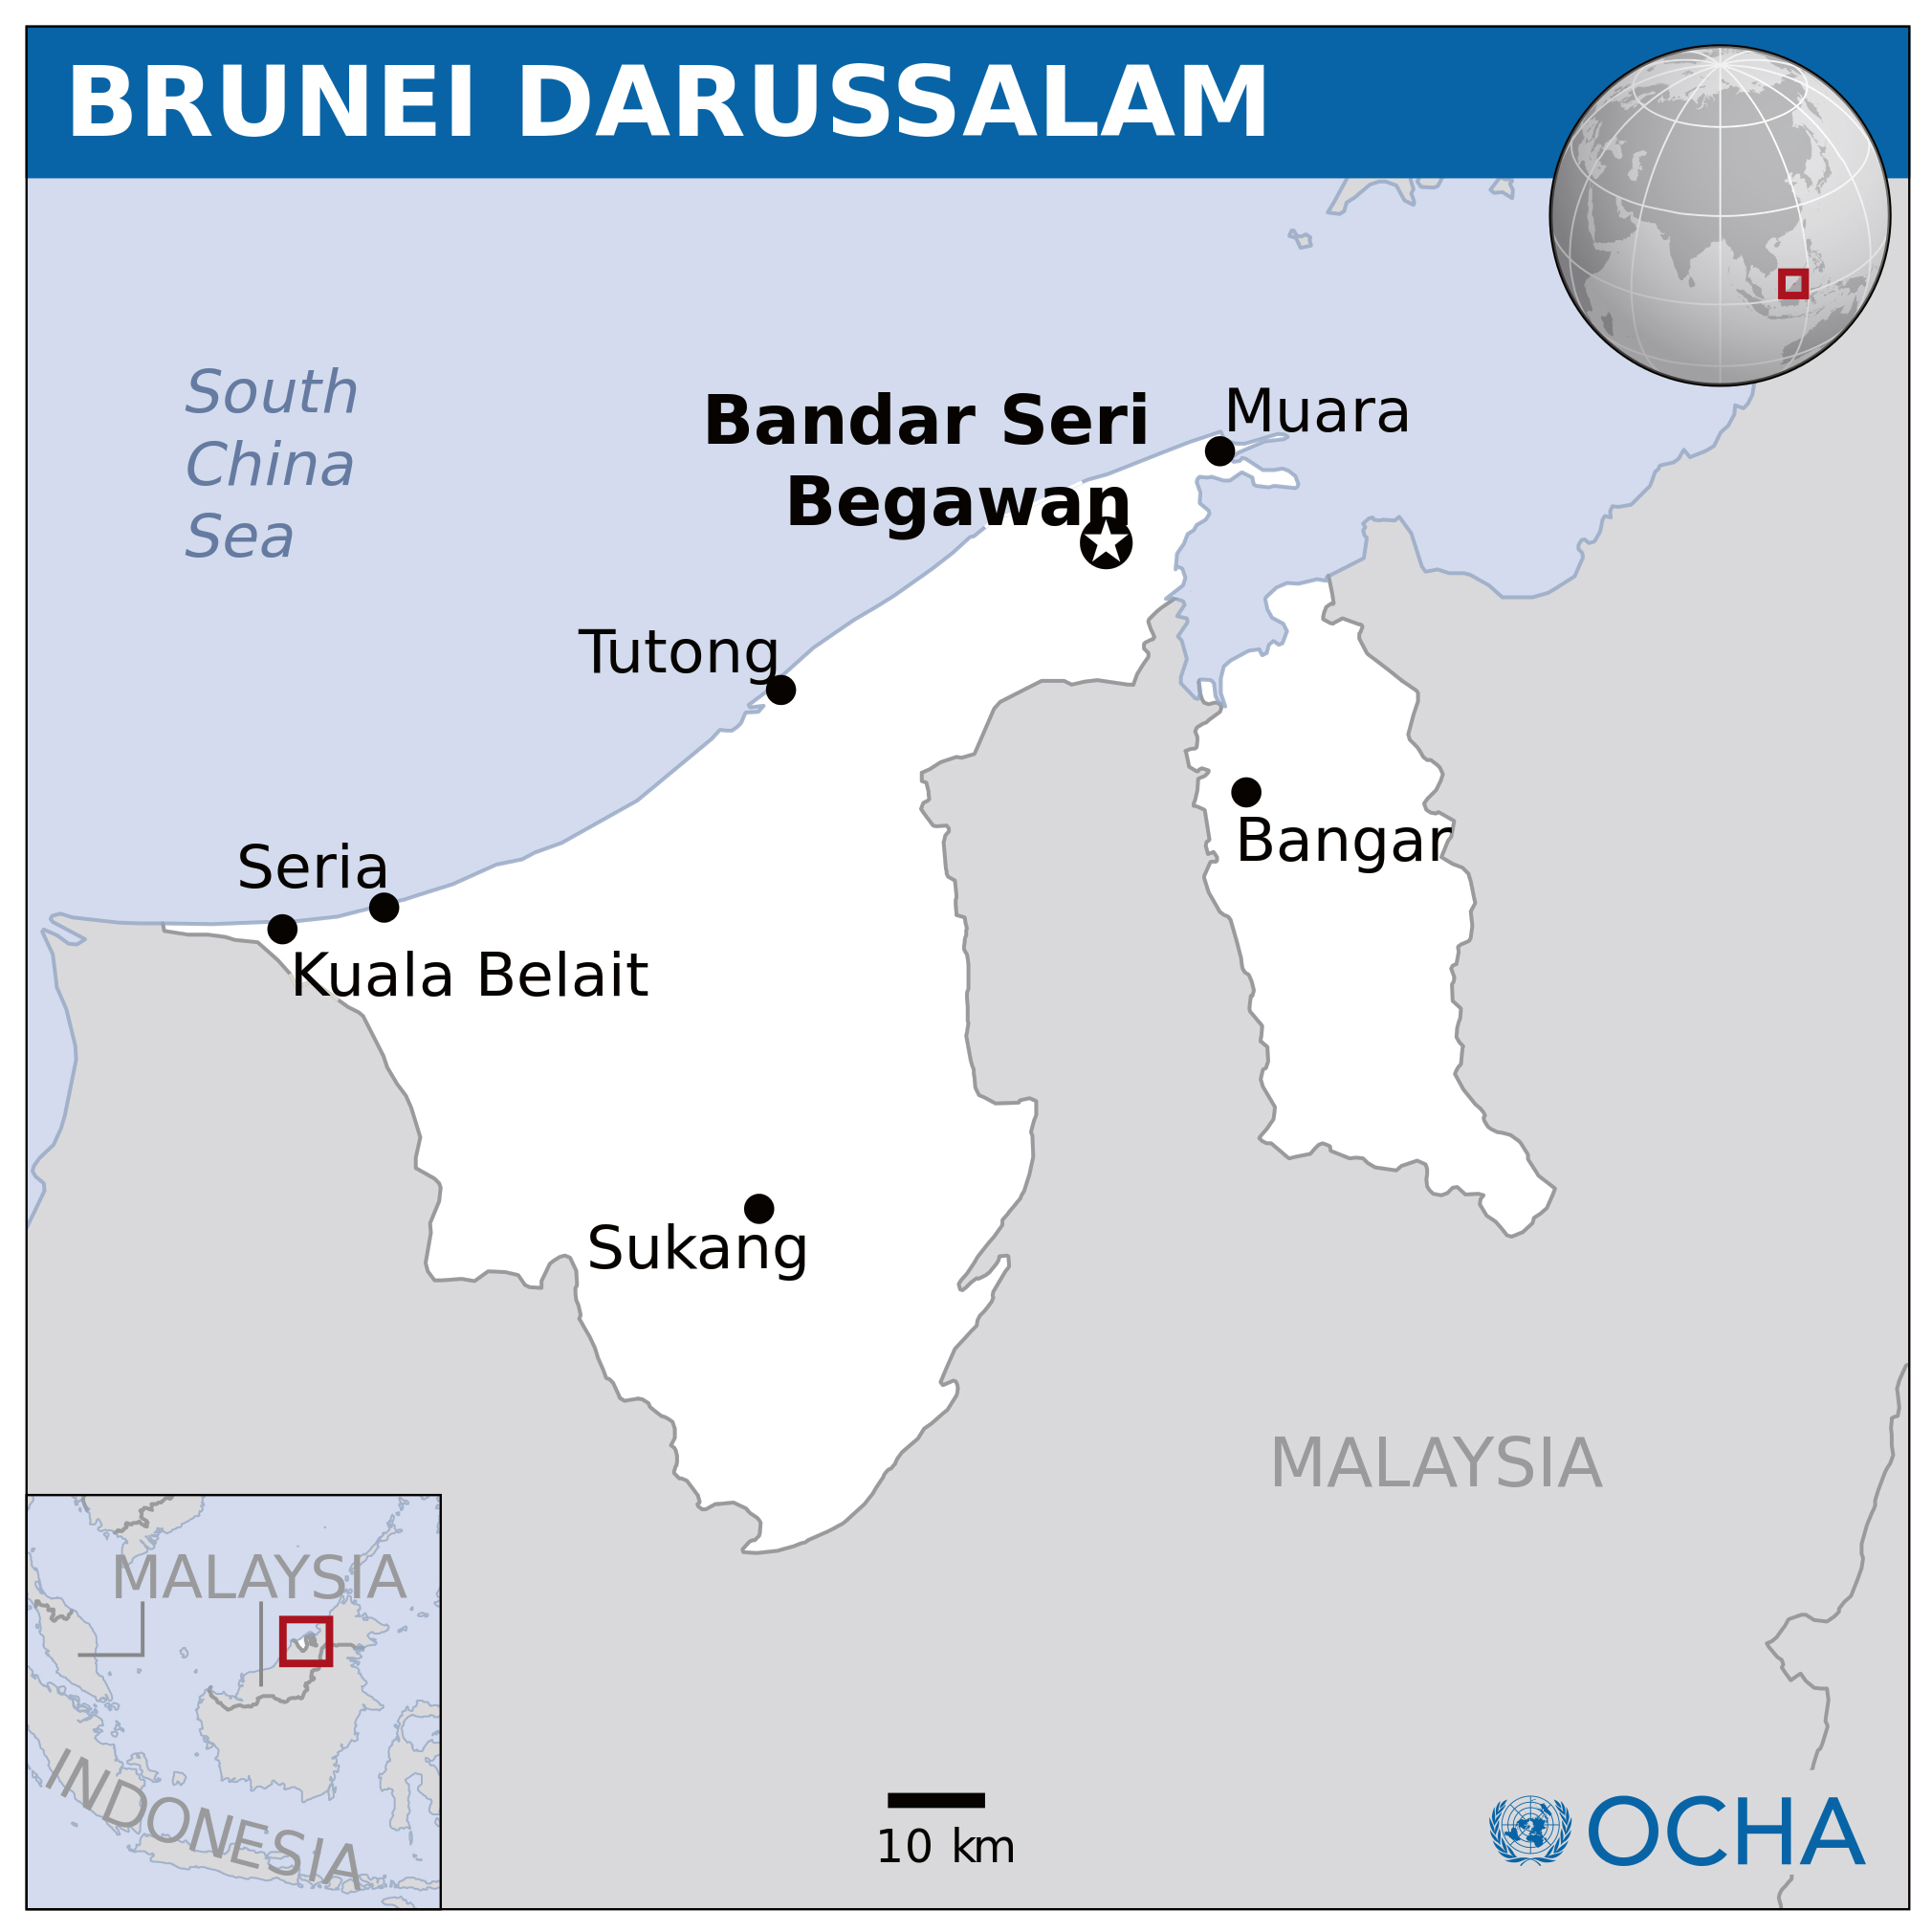 brunei darussalam travel map choice image